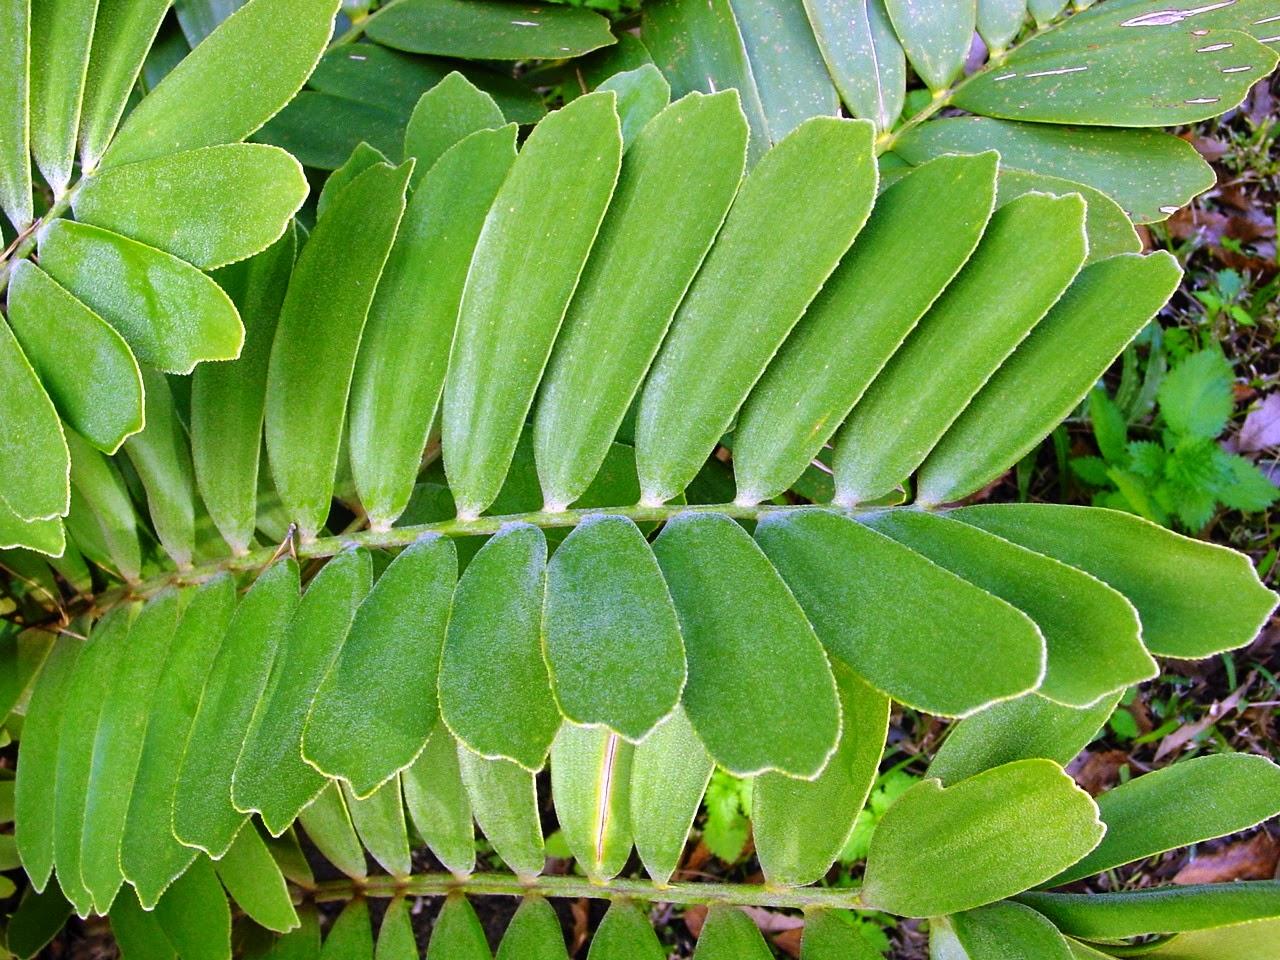 Jual pohon jamia(furfuracea) dan jamia (dollar) | aneka tanaman hias | suplier tanaman | jasa desain taman